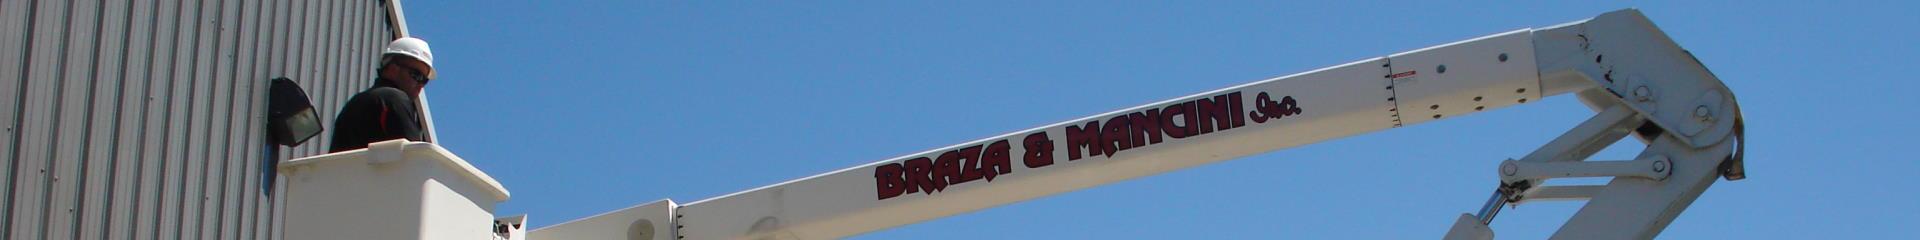 Braza and Mancini Boom Truck